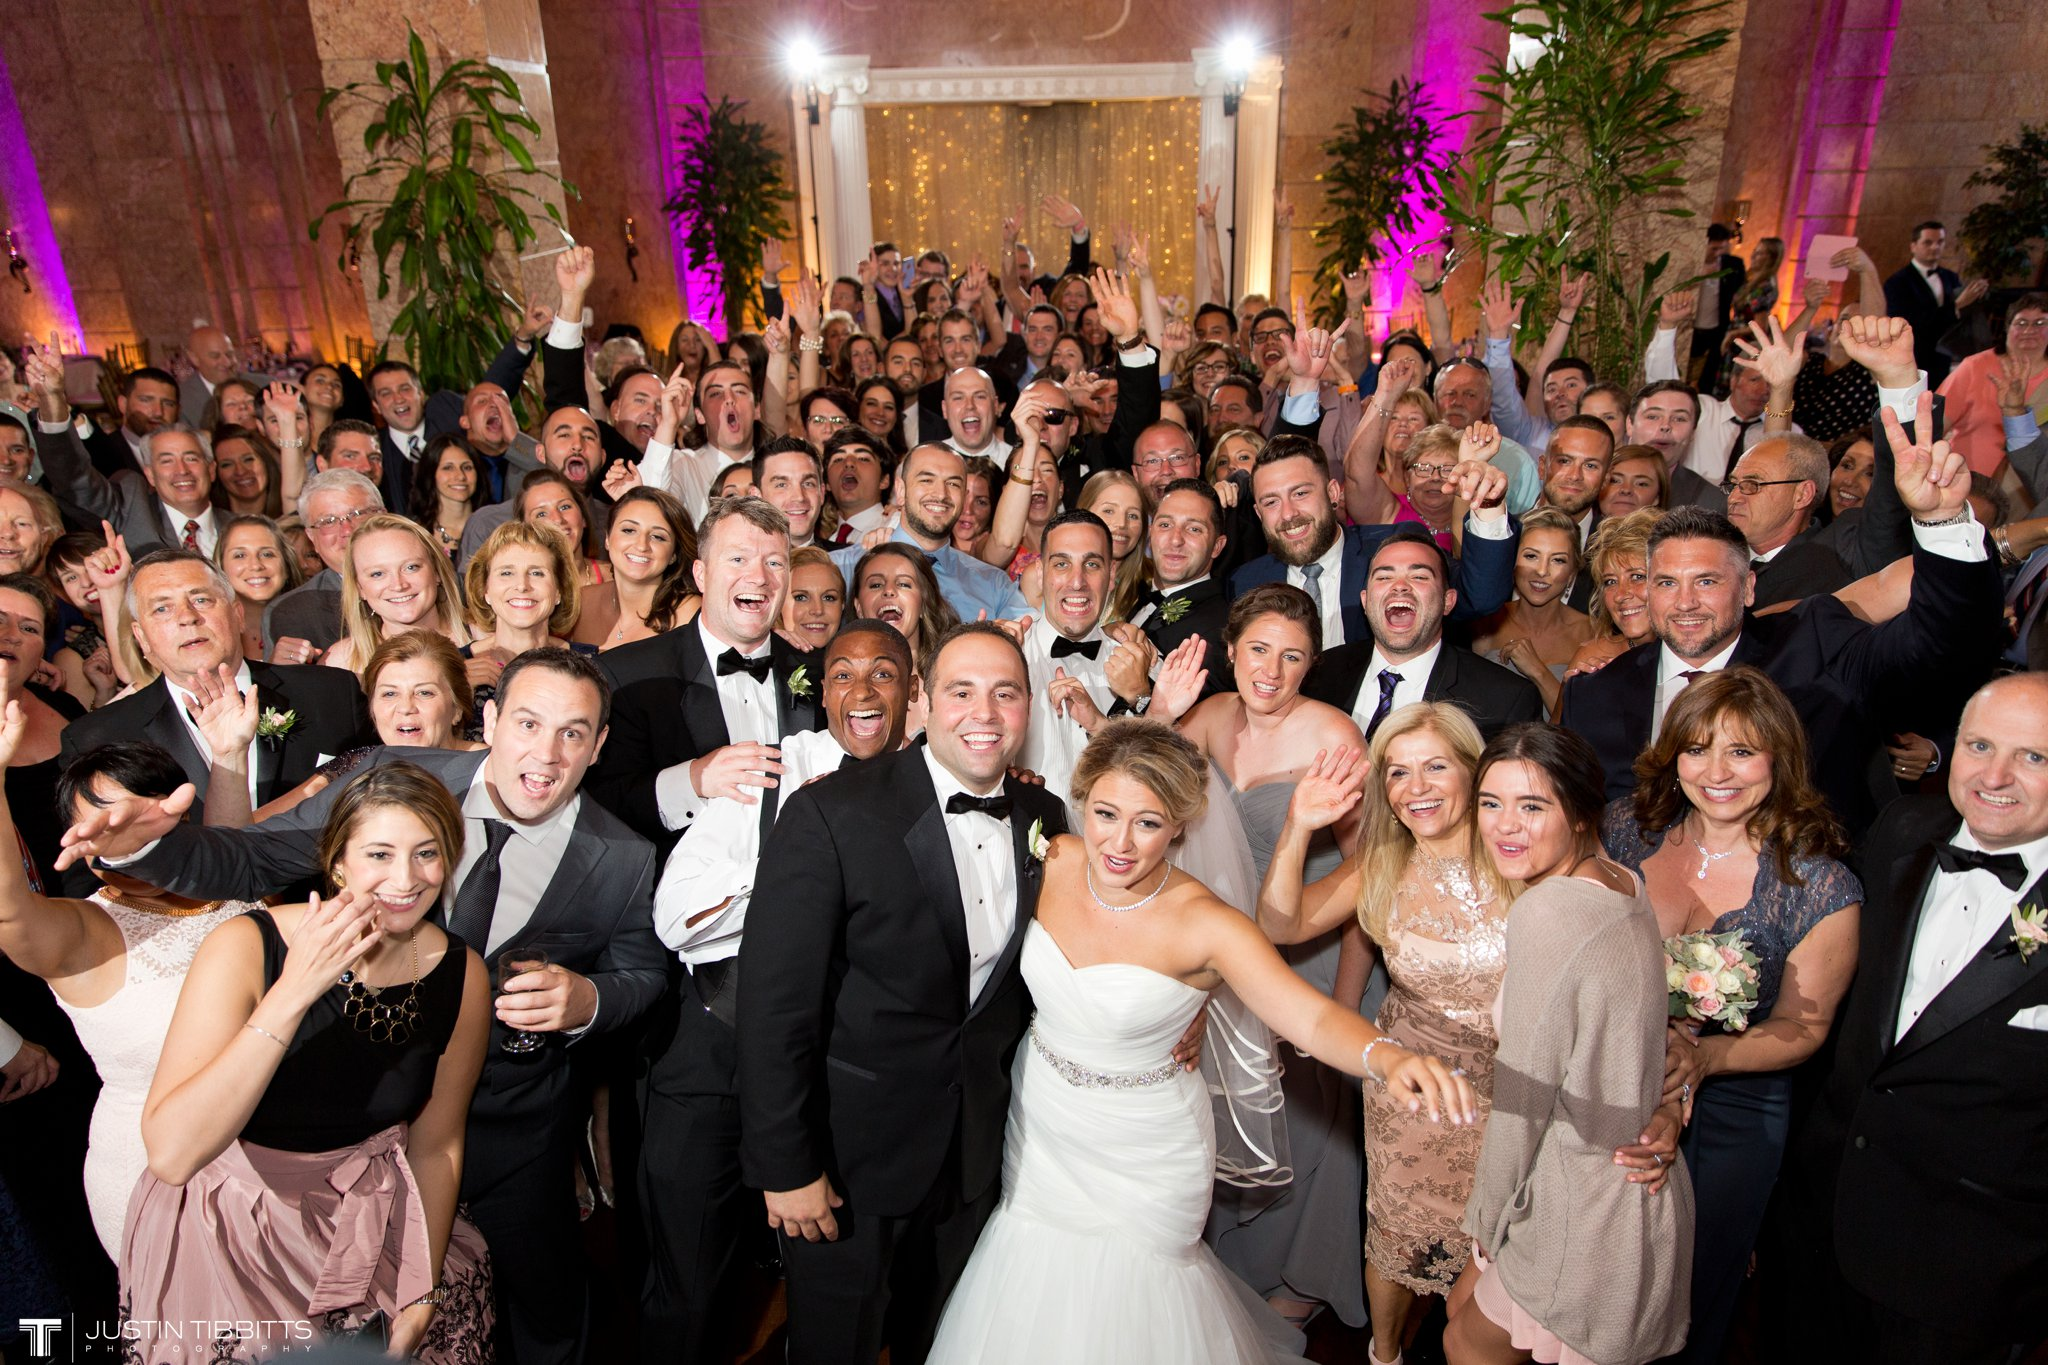 state-room-wedding-photos-with-amanda-and-nick_0155